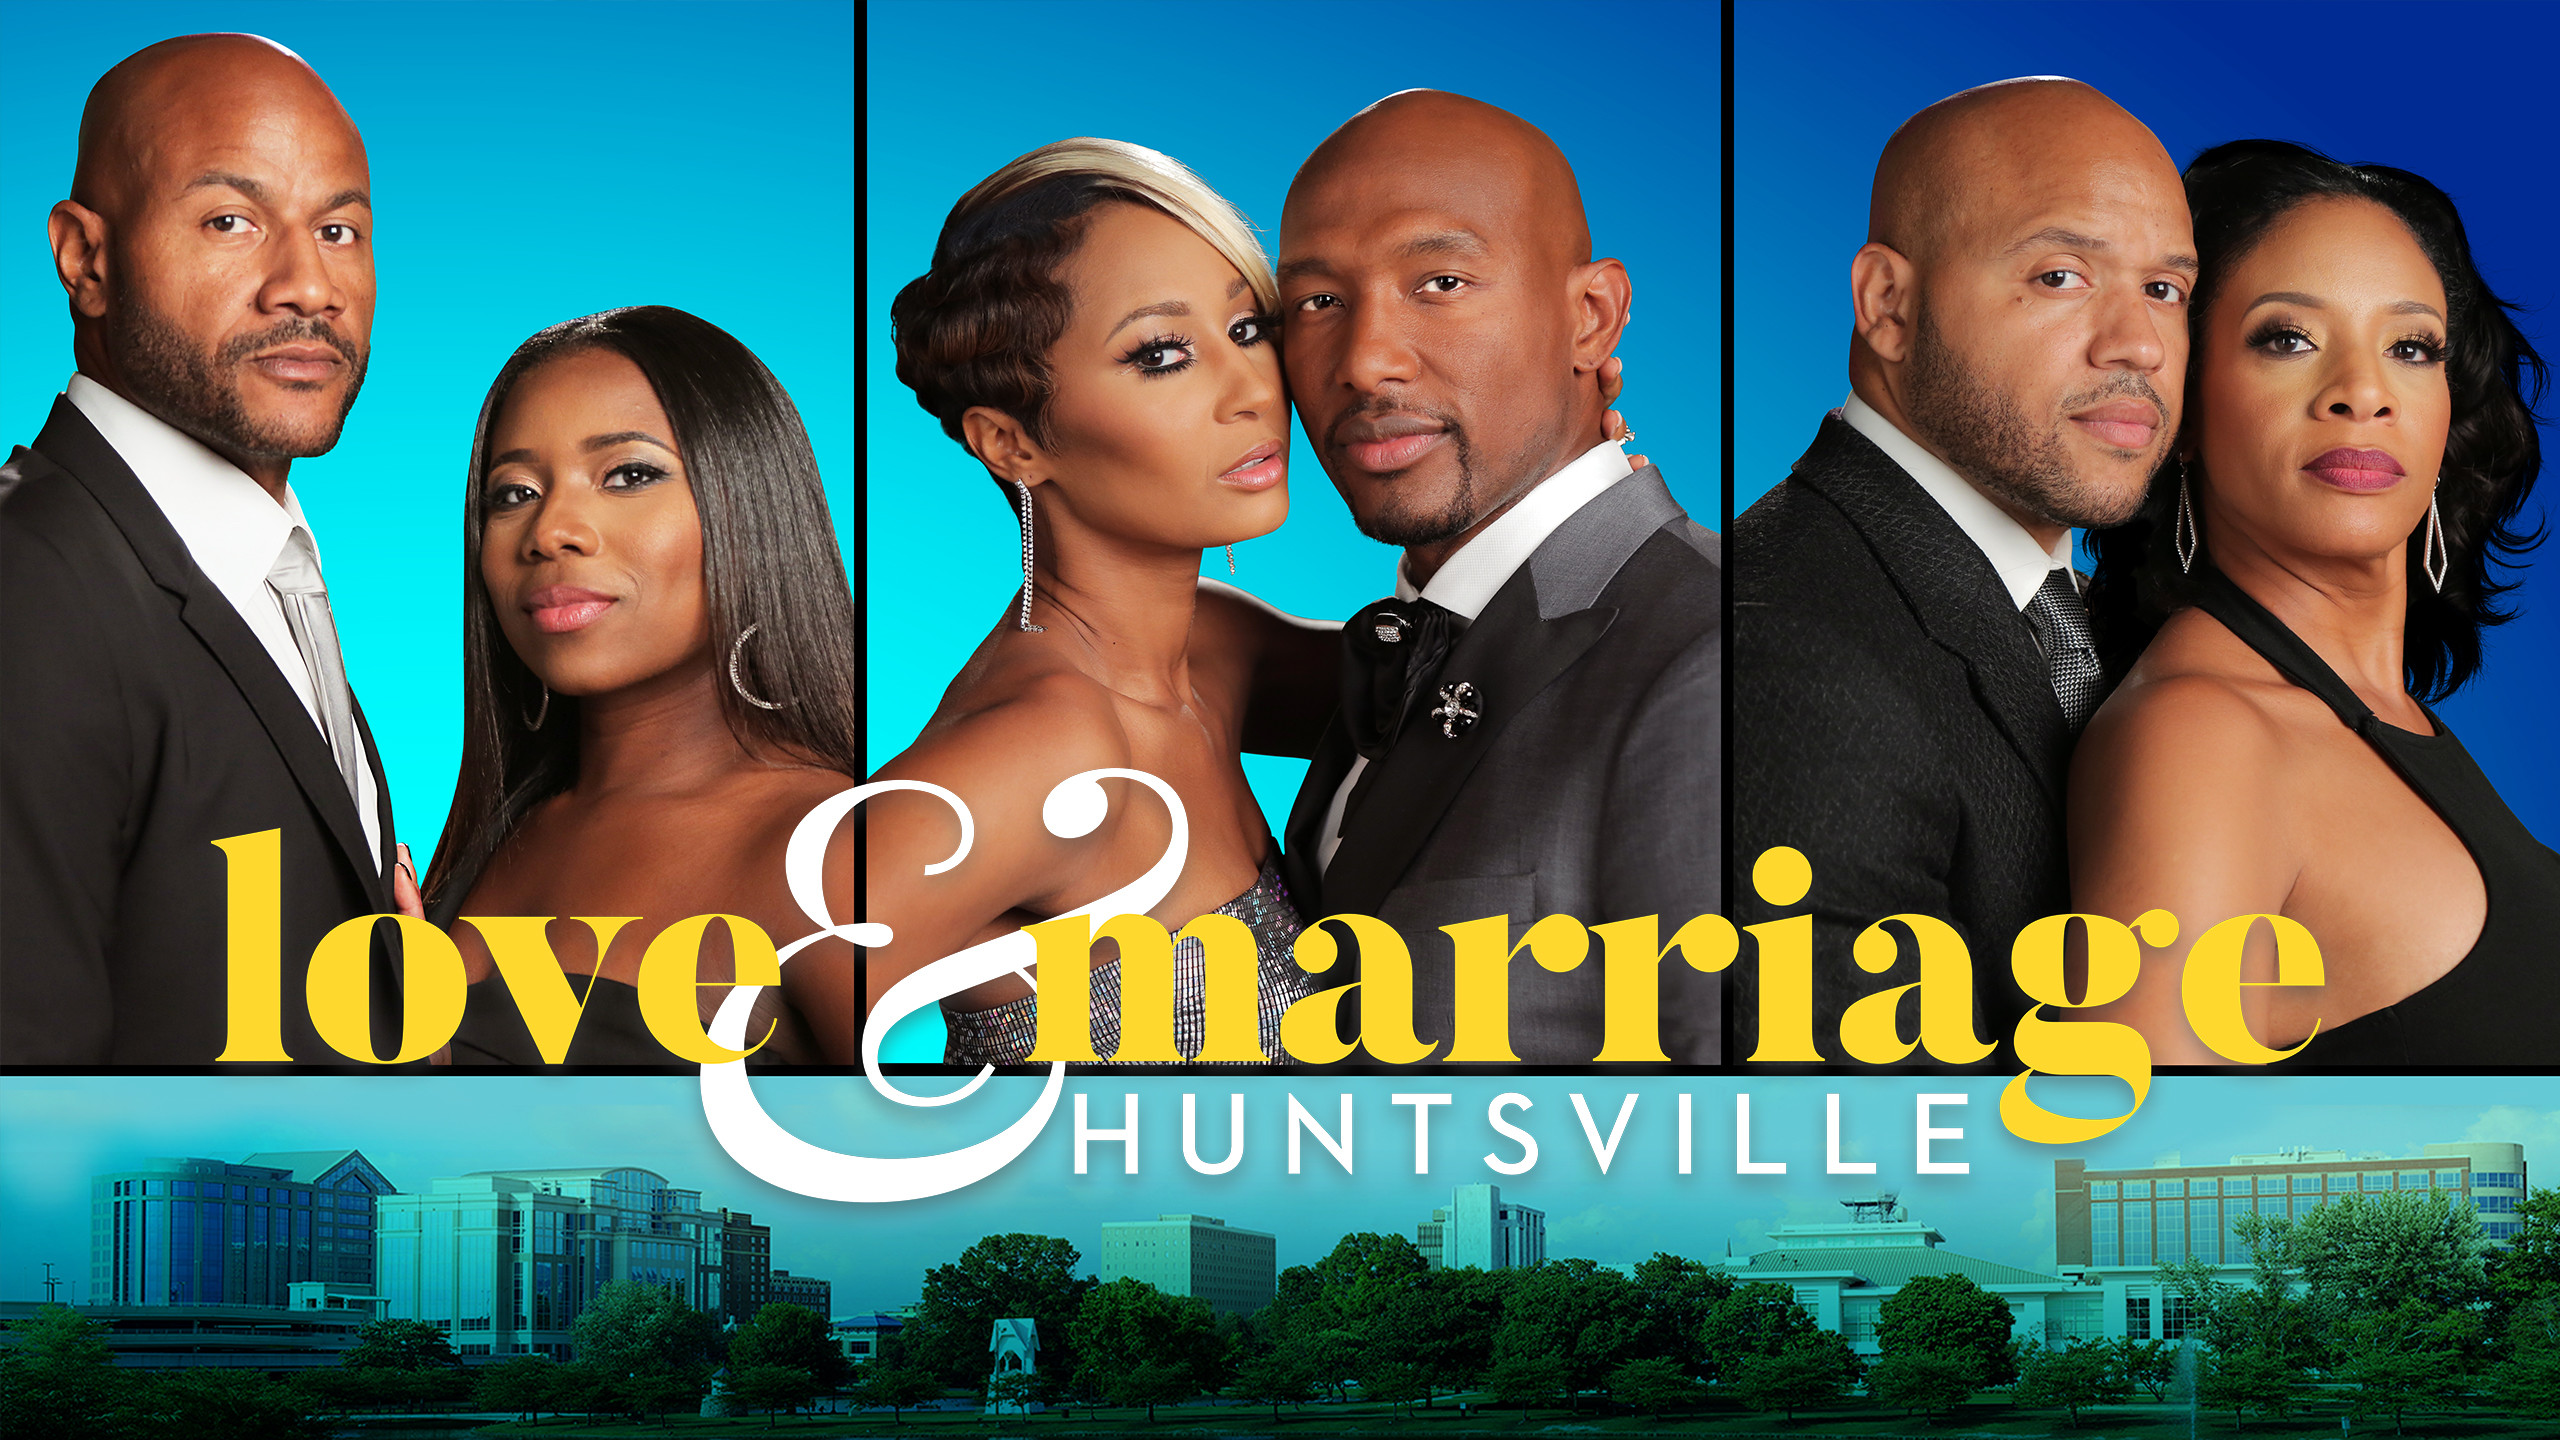 Get Out Tlc Tv Show Full Episodes love & marriage: huntsville